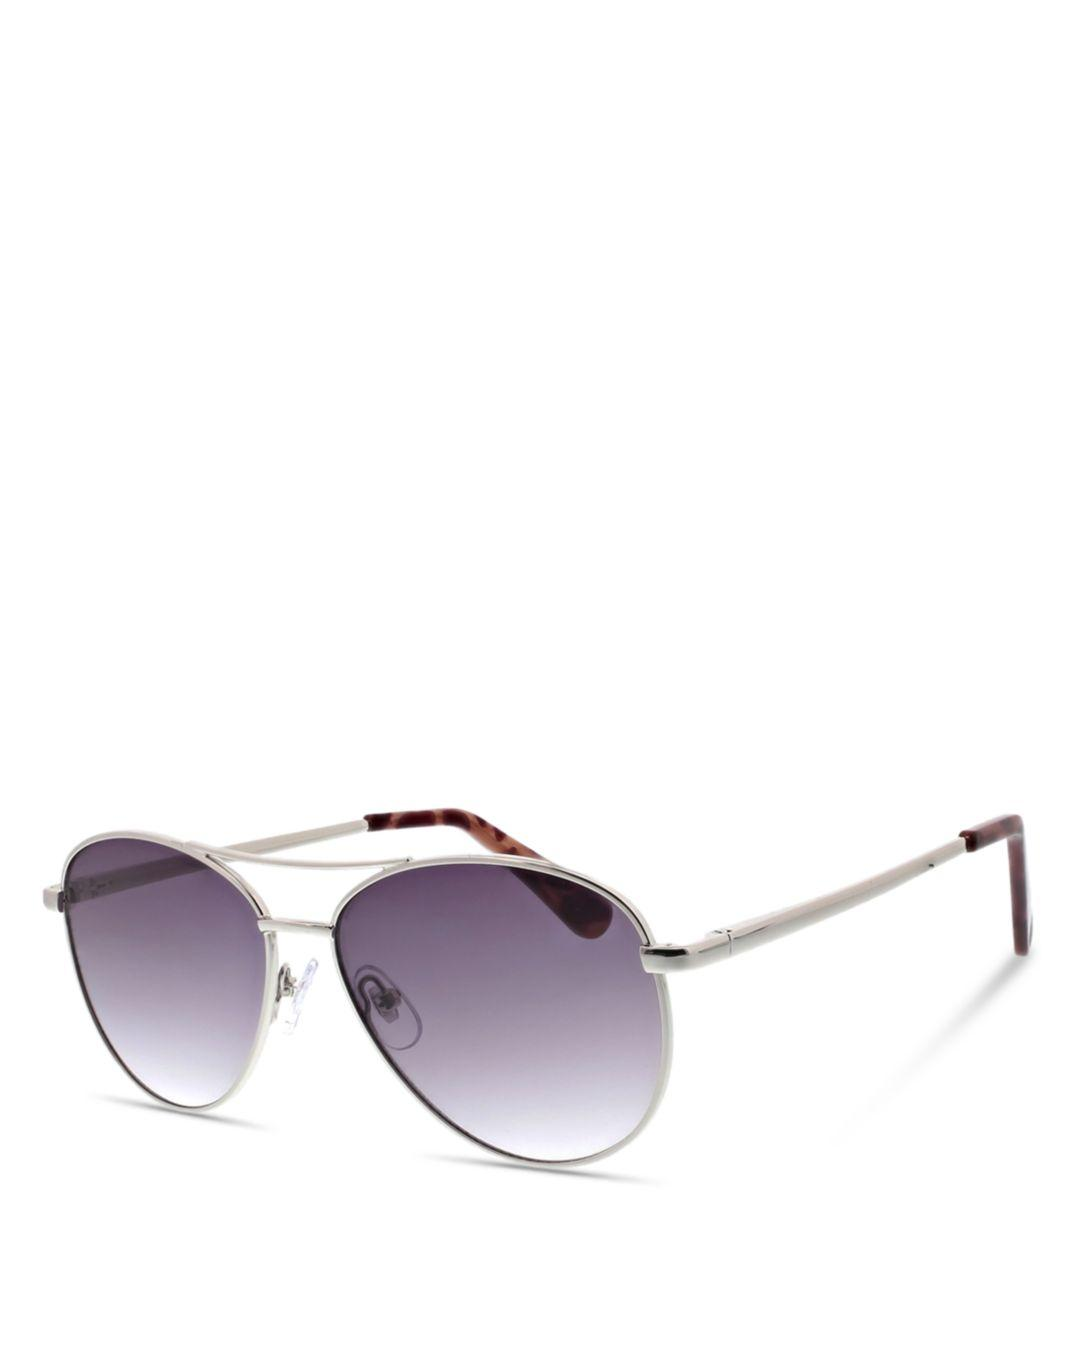 9dbfd9fff7f Lyst - BCBGeneration Women s Modern Aviator Sunglasses